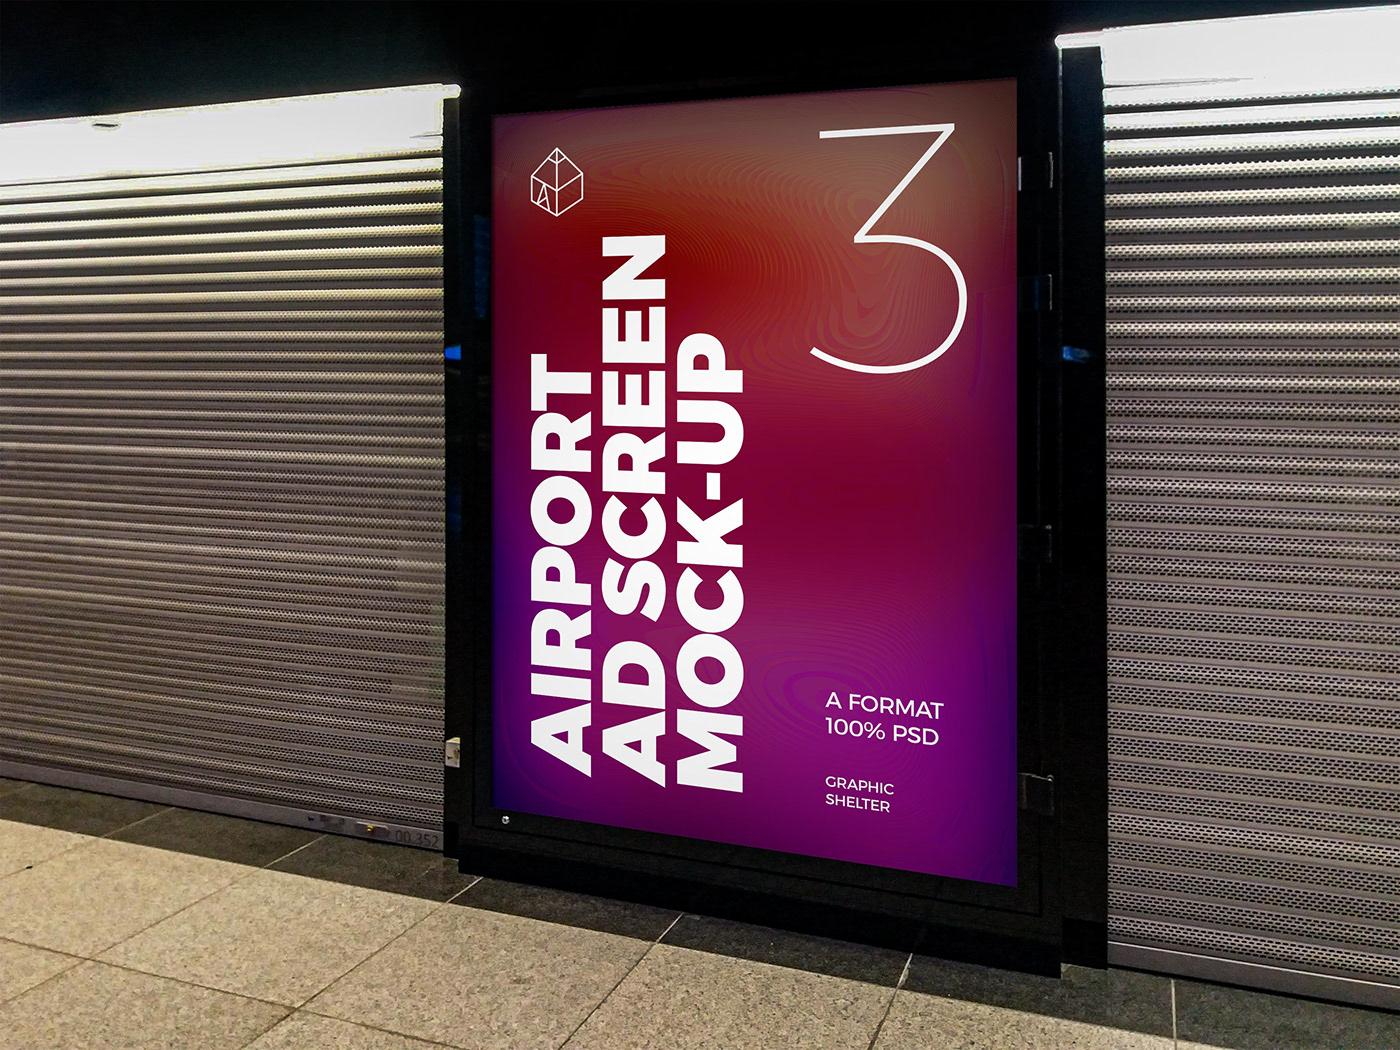 ad advertisement Advertising  airport design mock-up Mockup port poster screen